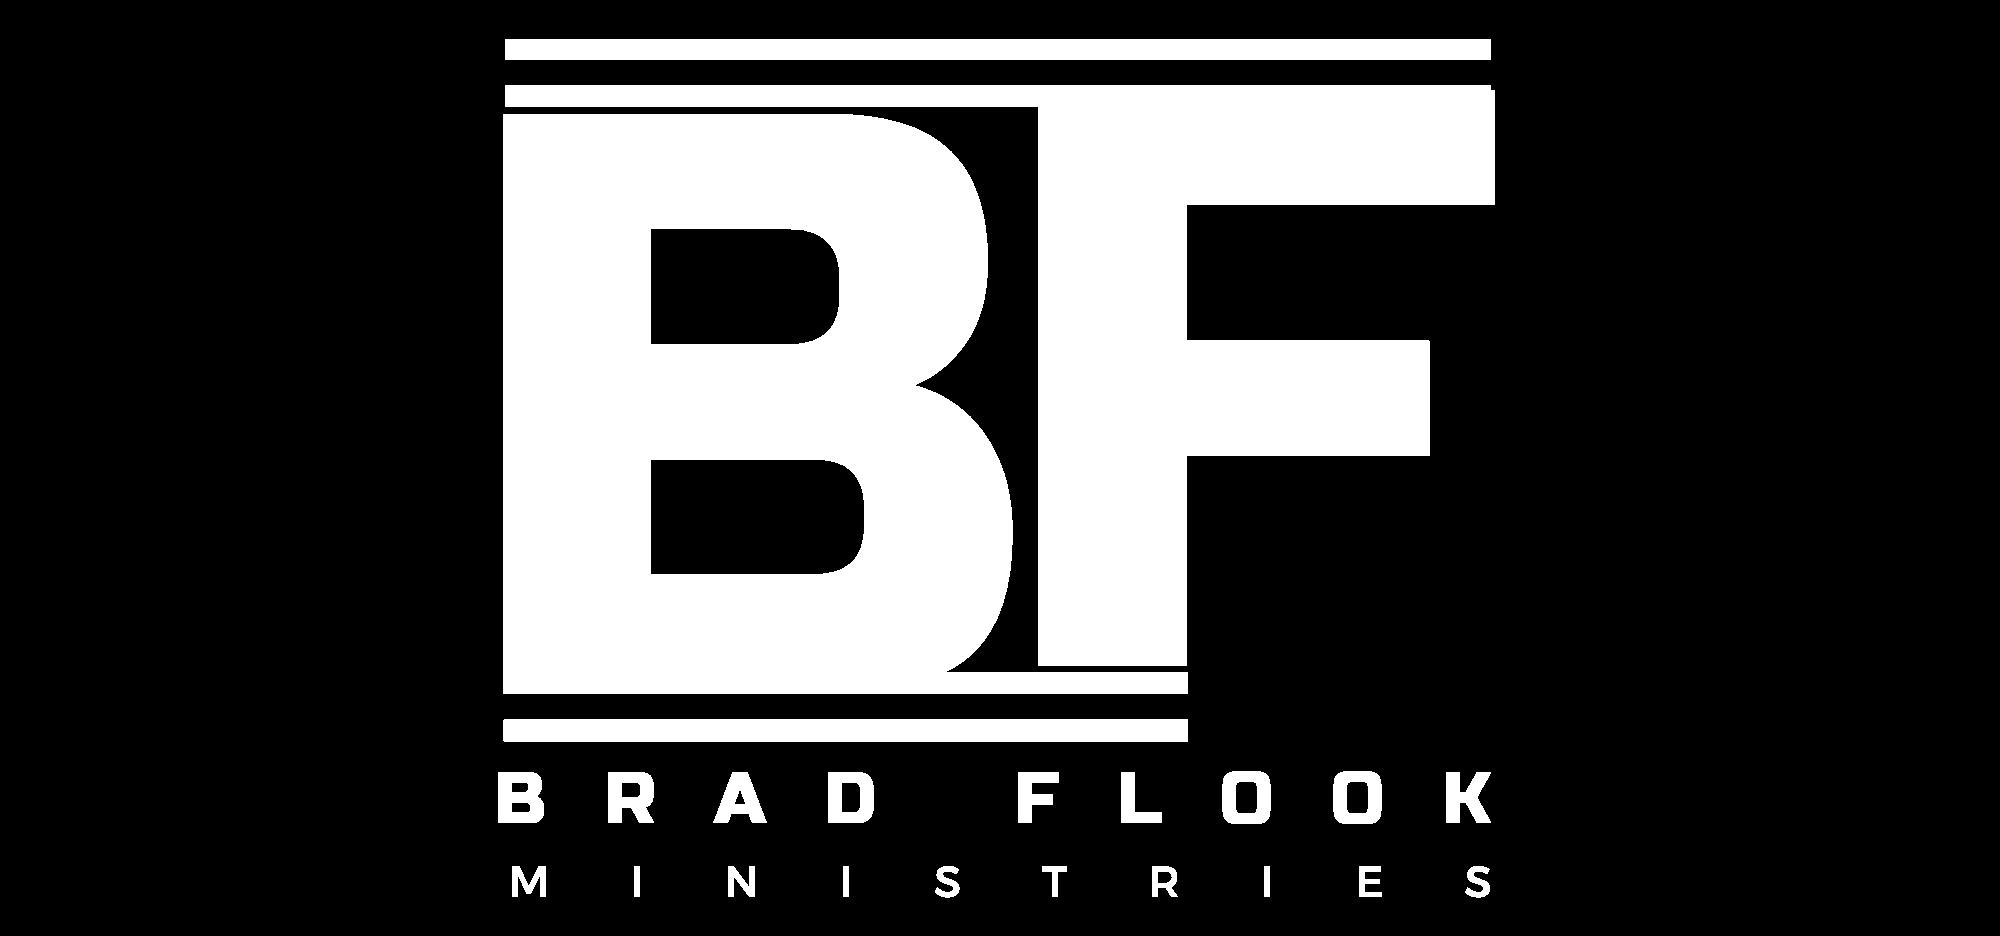 bradflookministries